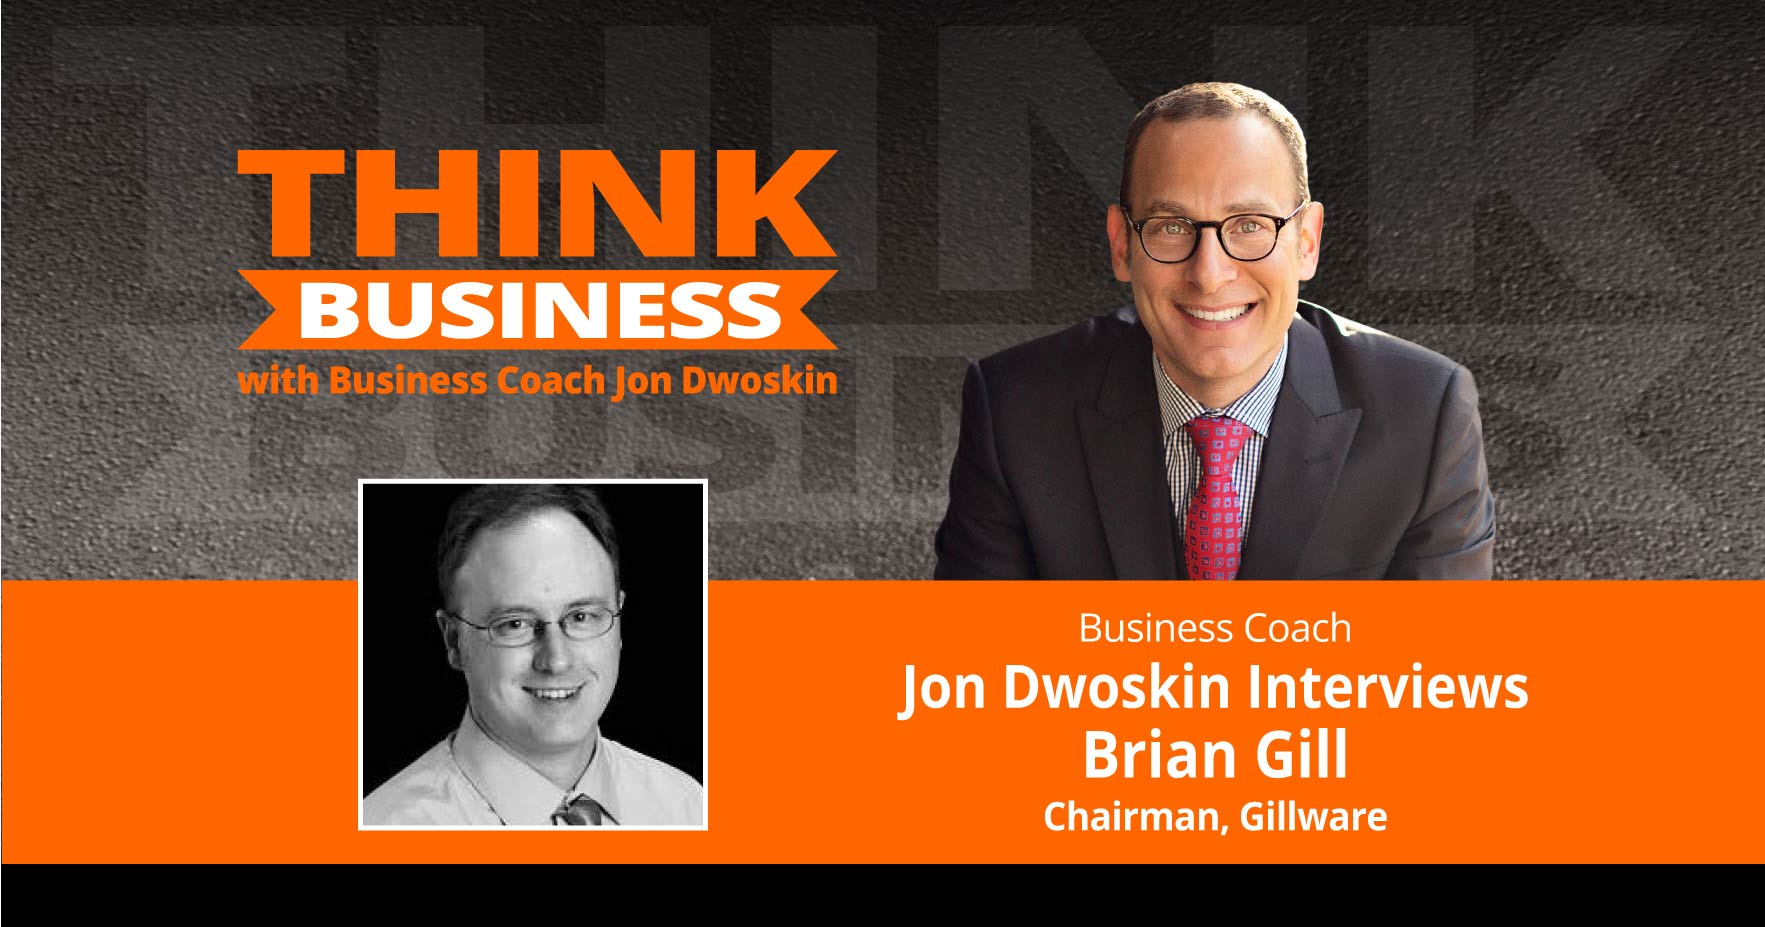 THINK Business Podcast: Jon Dwoskin Interviews Brian Gill, Chairman, Gillware